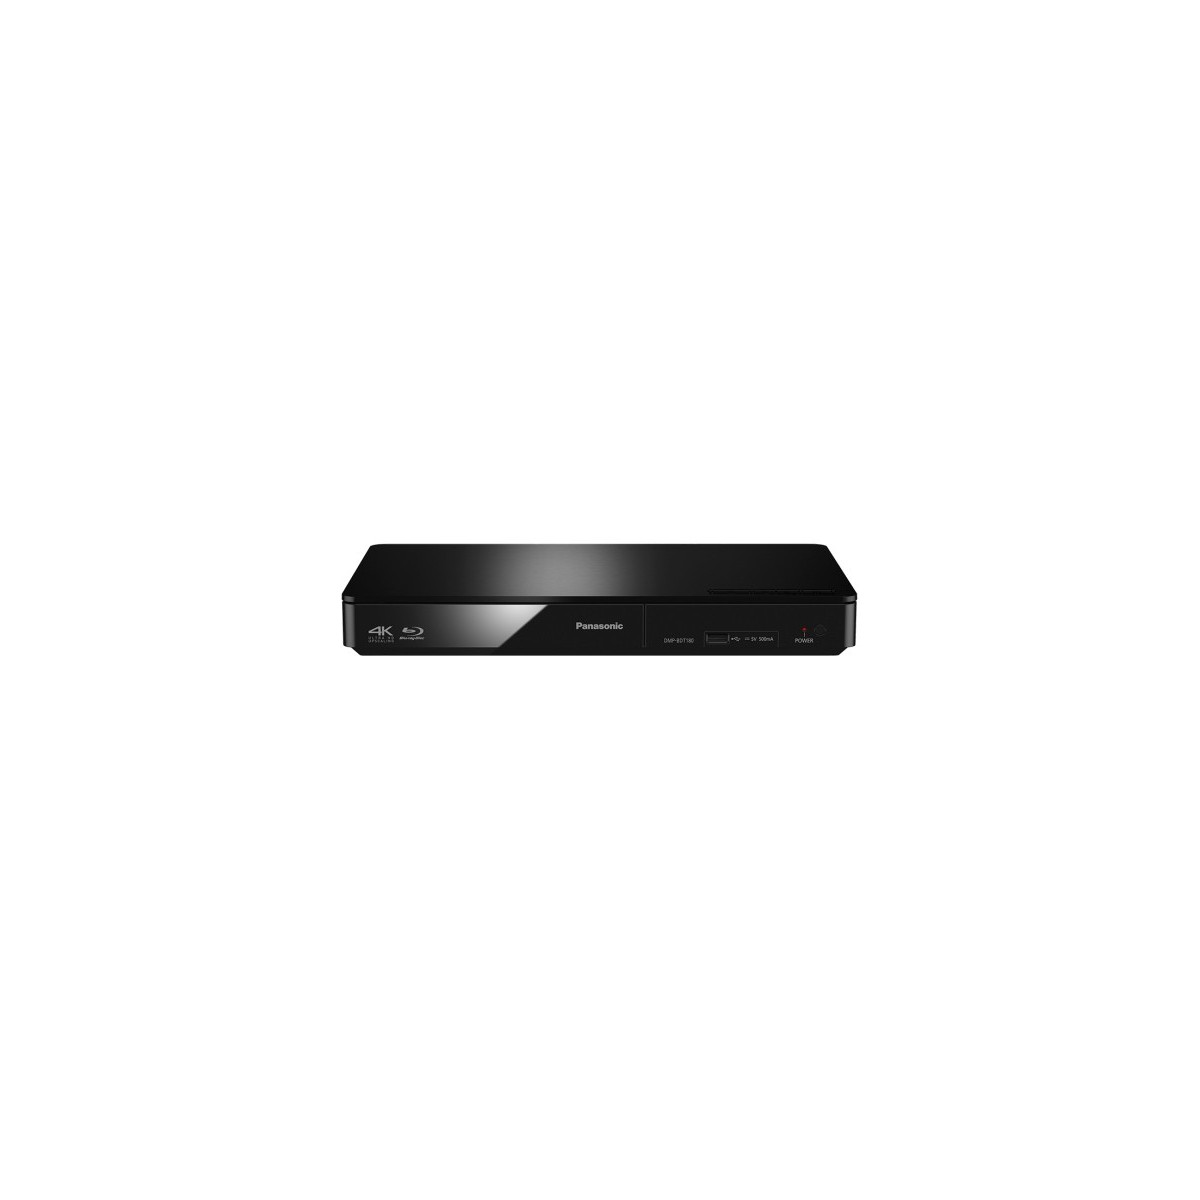 PANASONIC DMPBDT180 3D SmartTV